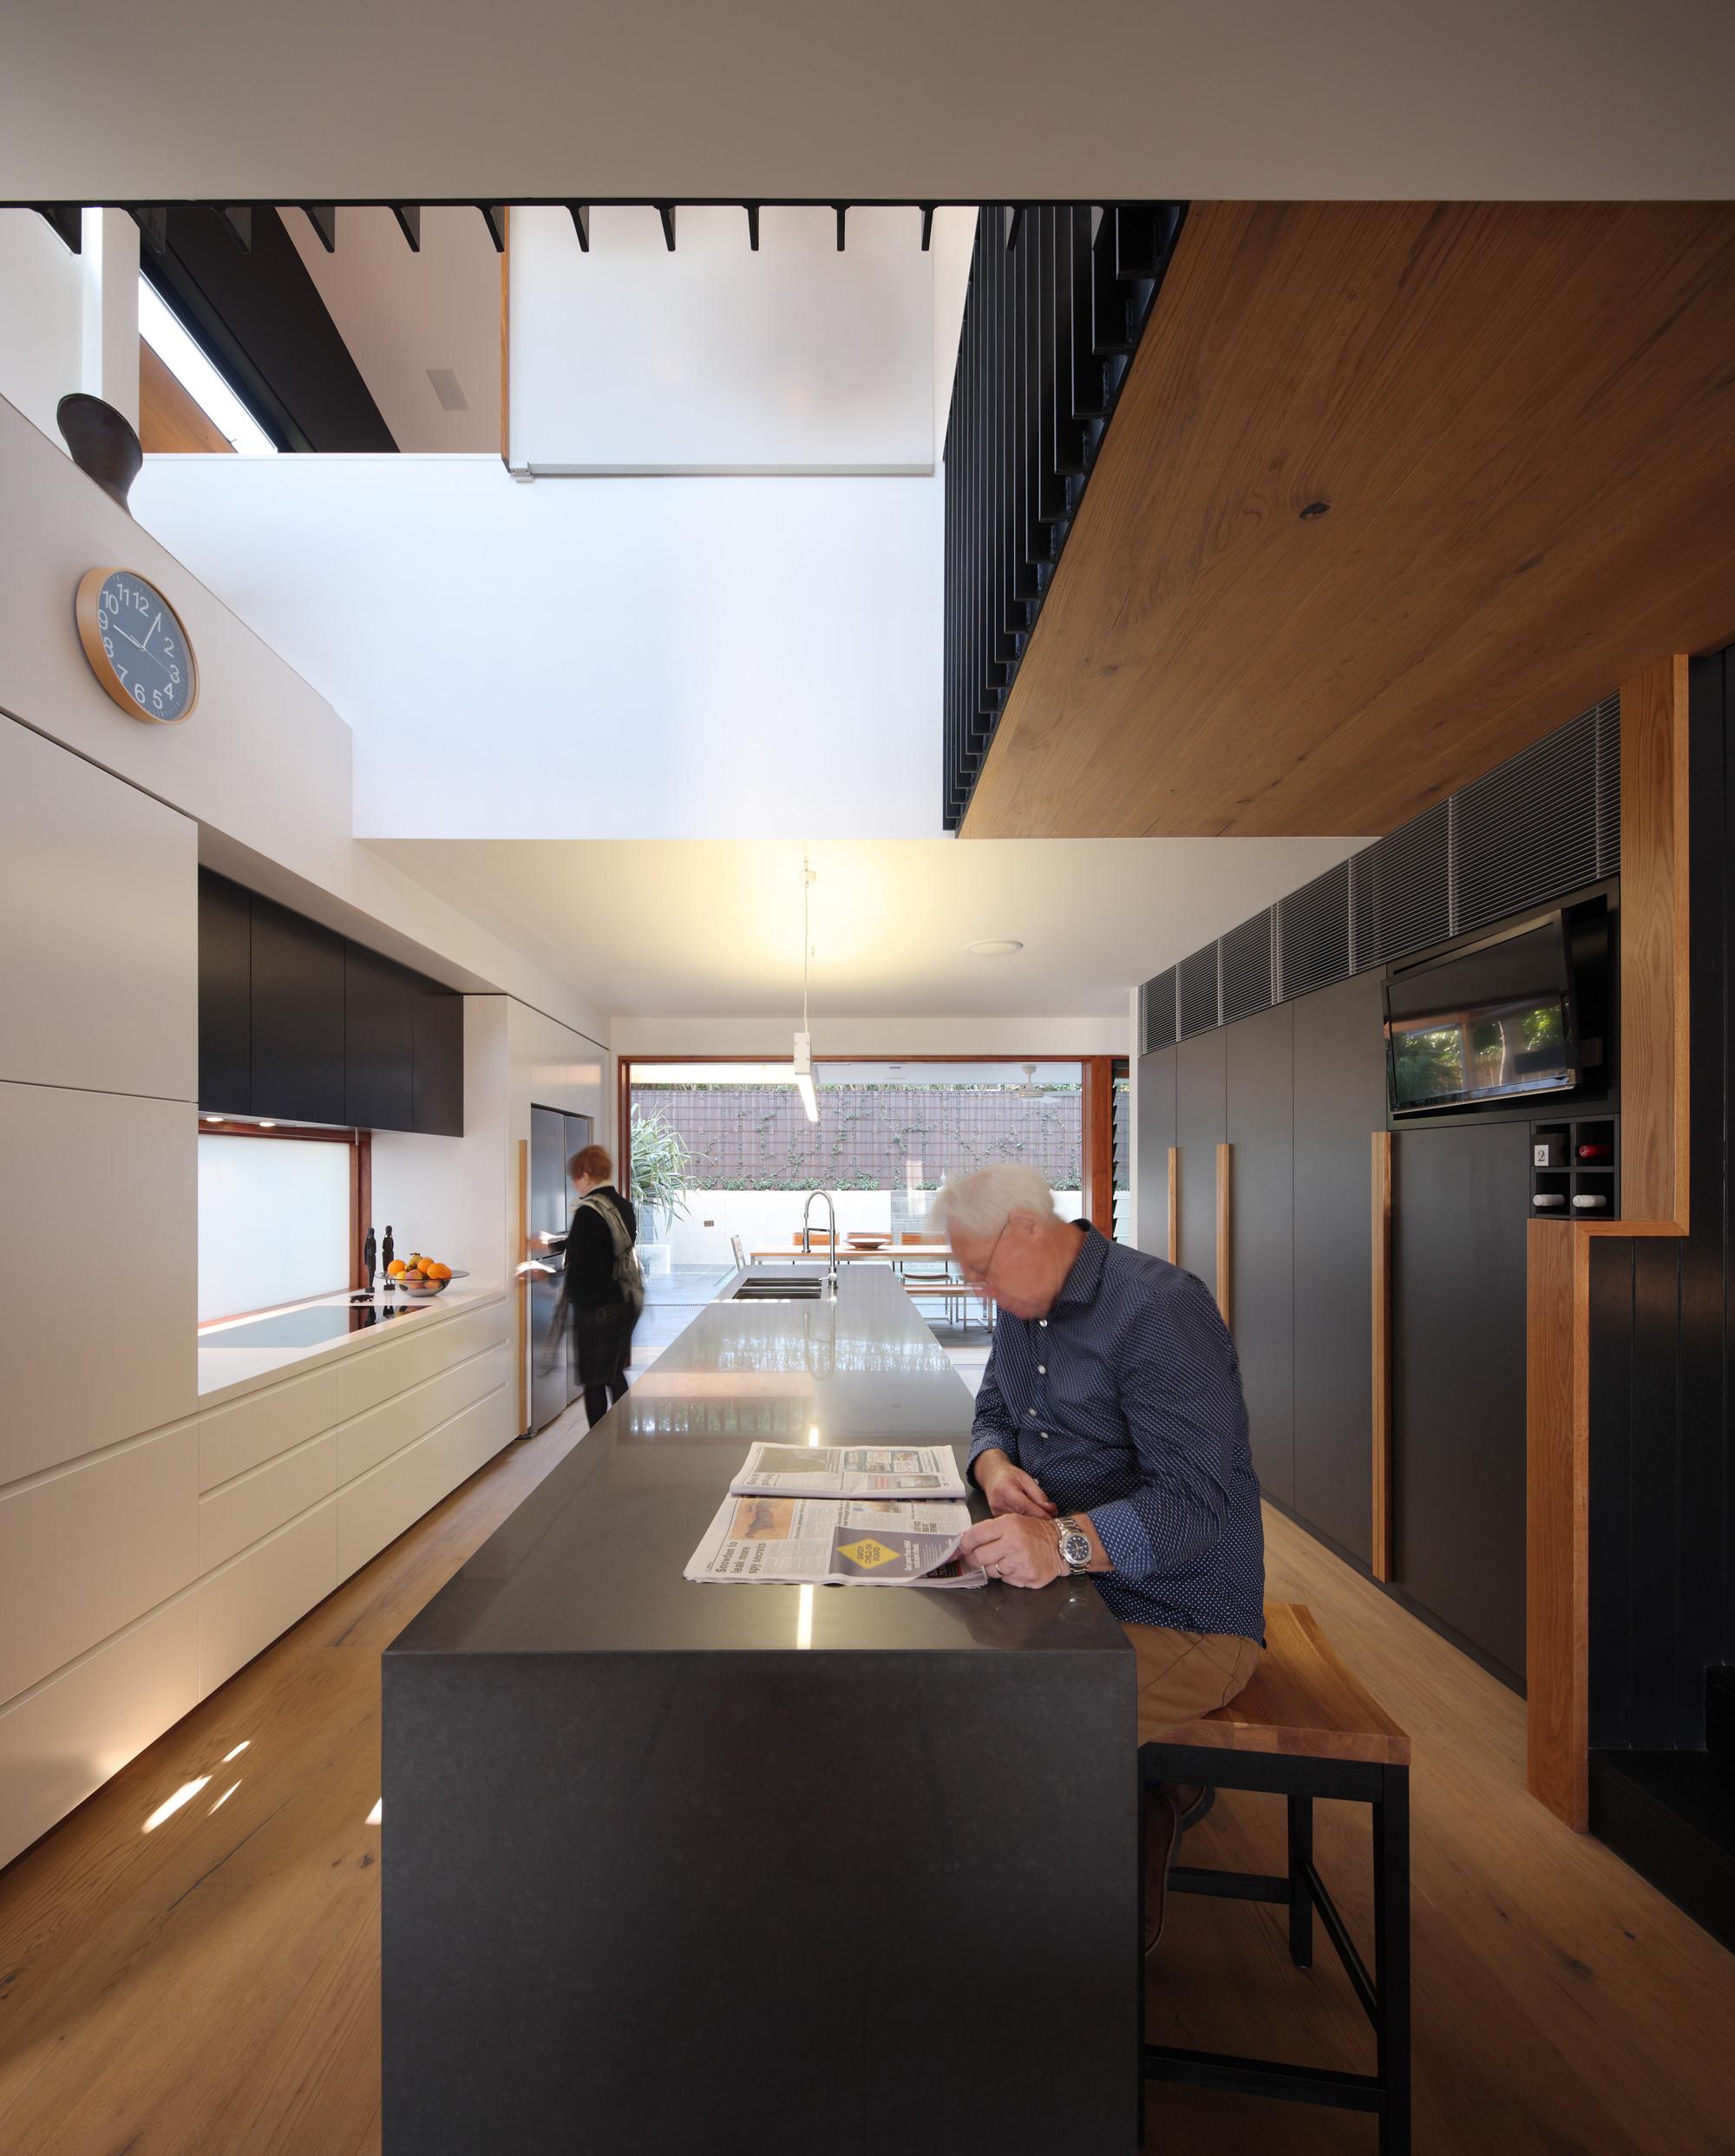 Beeston Street House by Shaun Lockyer Architects (via Lunchbox Architect)